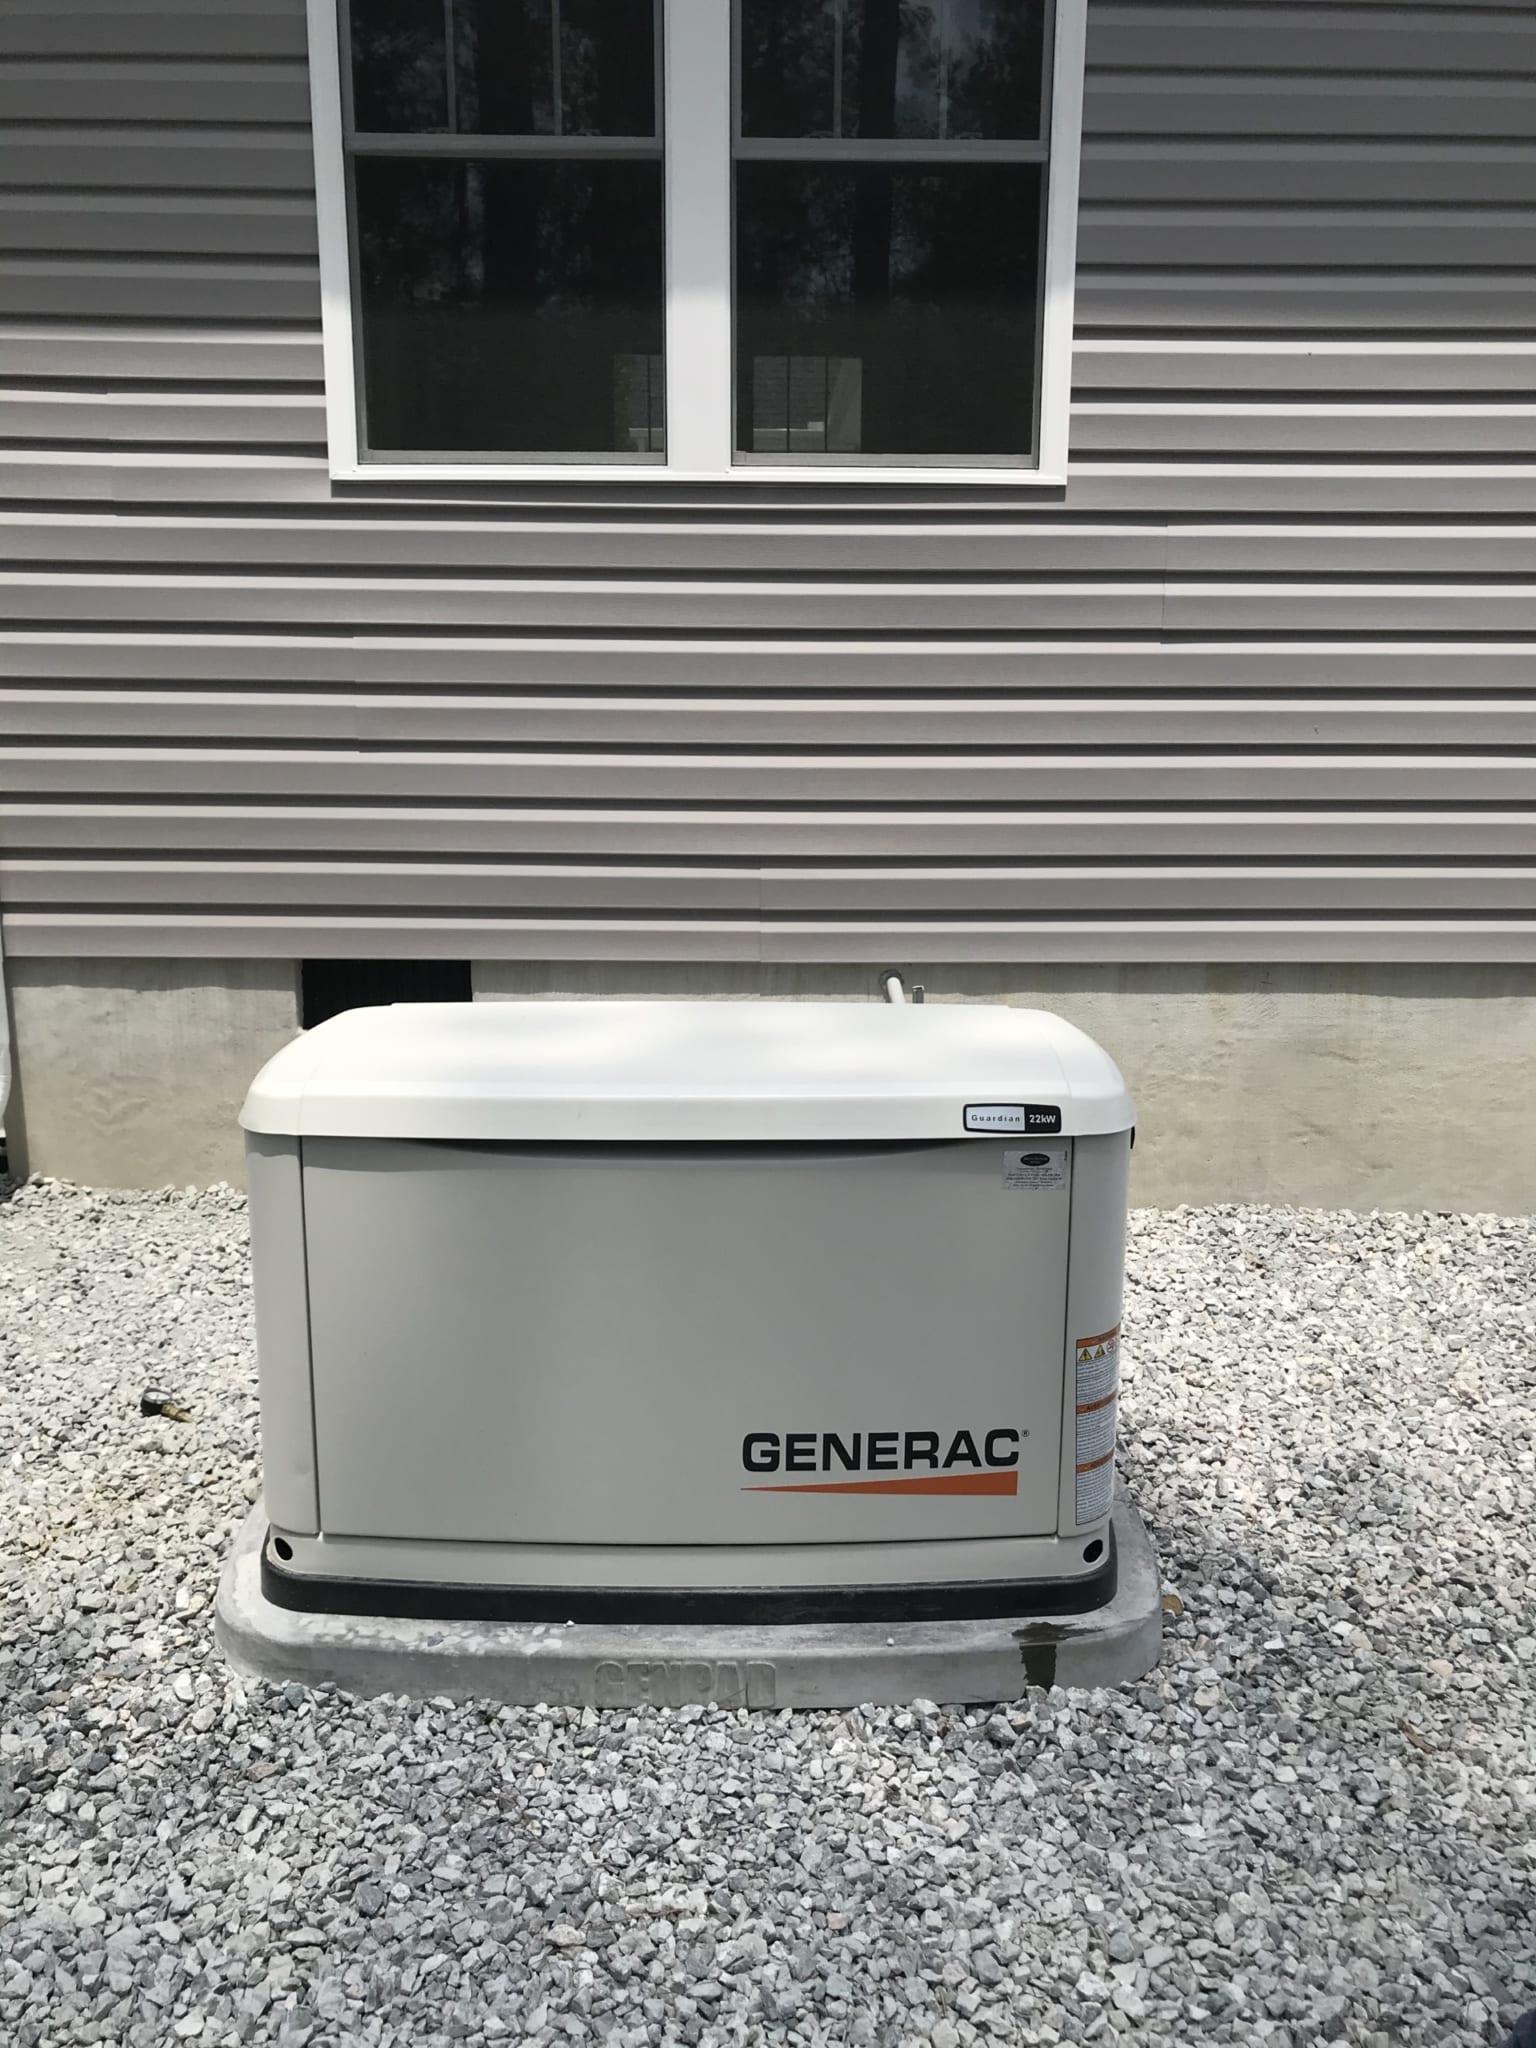 6.10.20 Charles City Generac Automatic Standby Generator